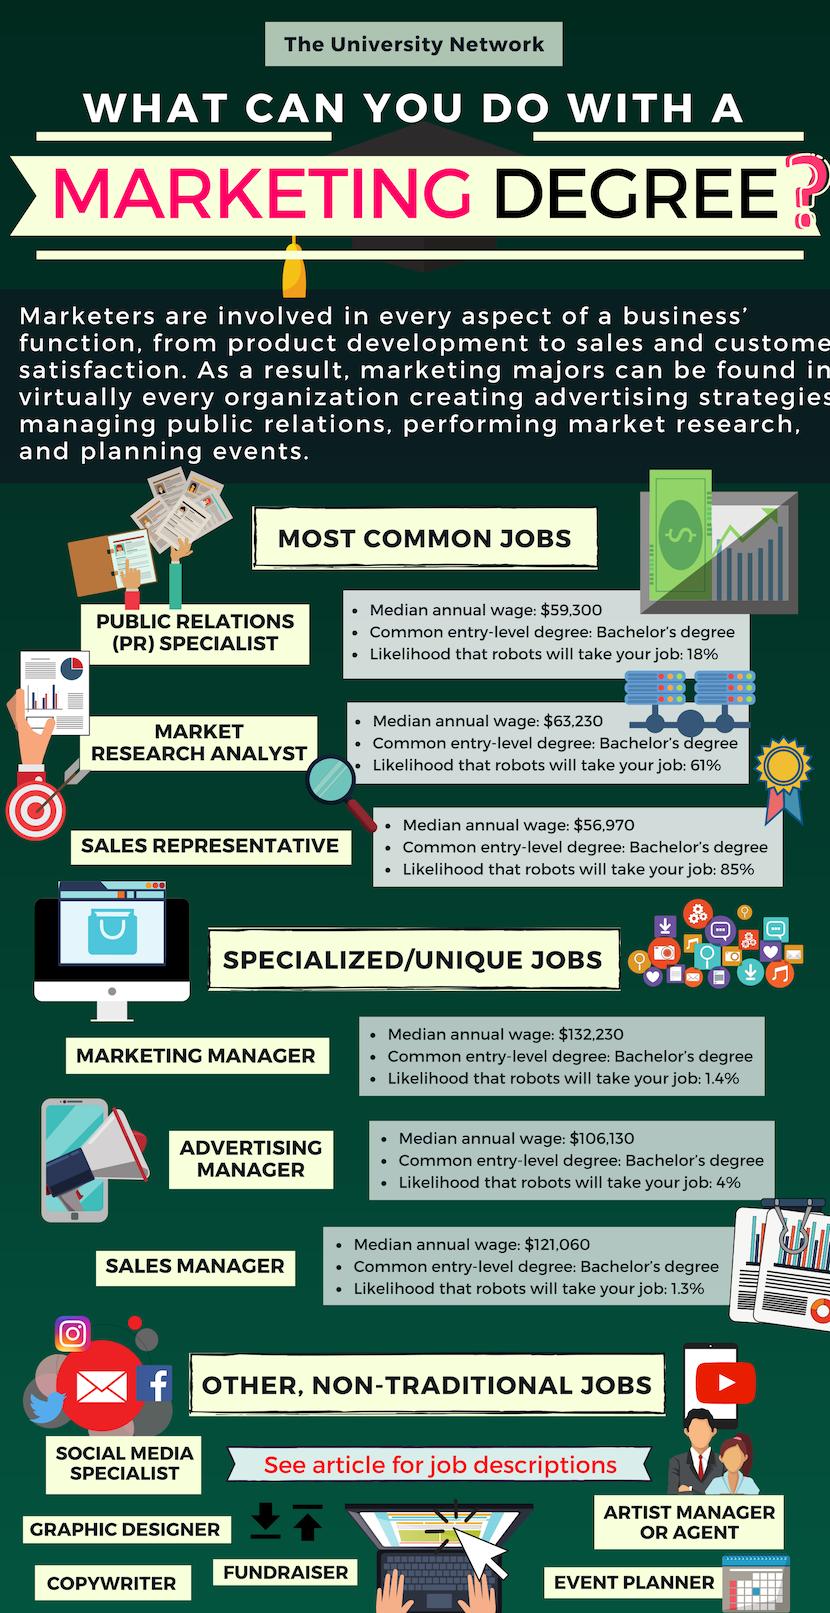 12 Jobs For Marketing Majors The University Network Marketing Degree Public Relations Degree Jobs